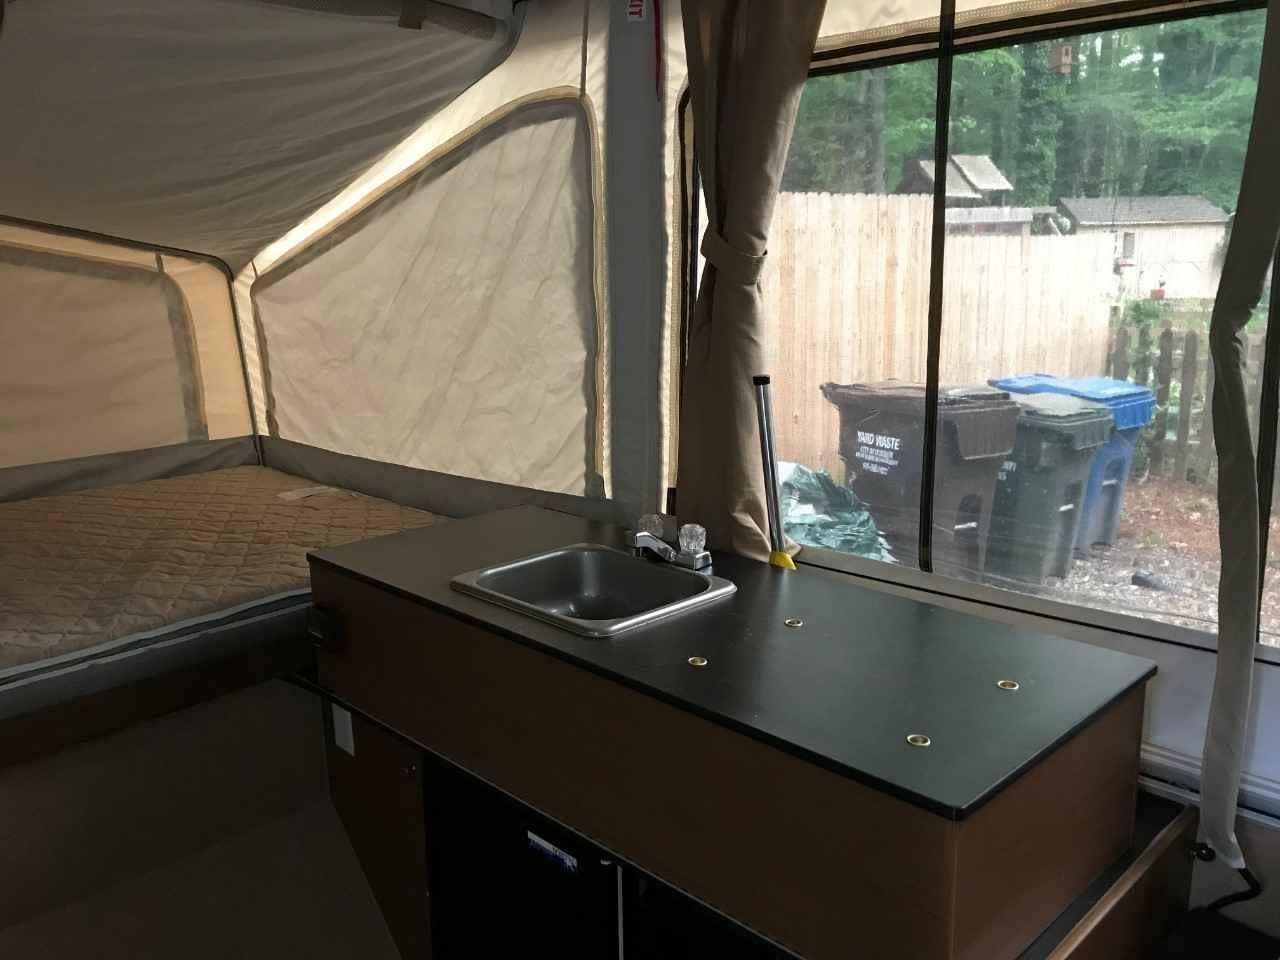 2014 Used Starcraft COMET Pop Up Camper in North Carolina NC